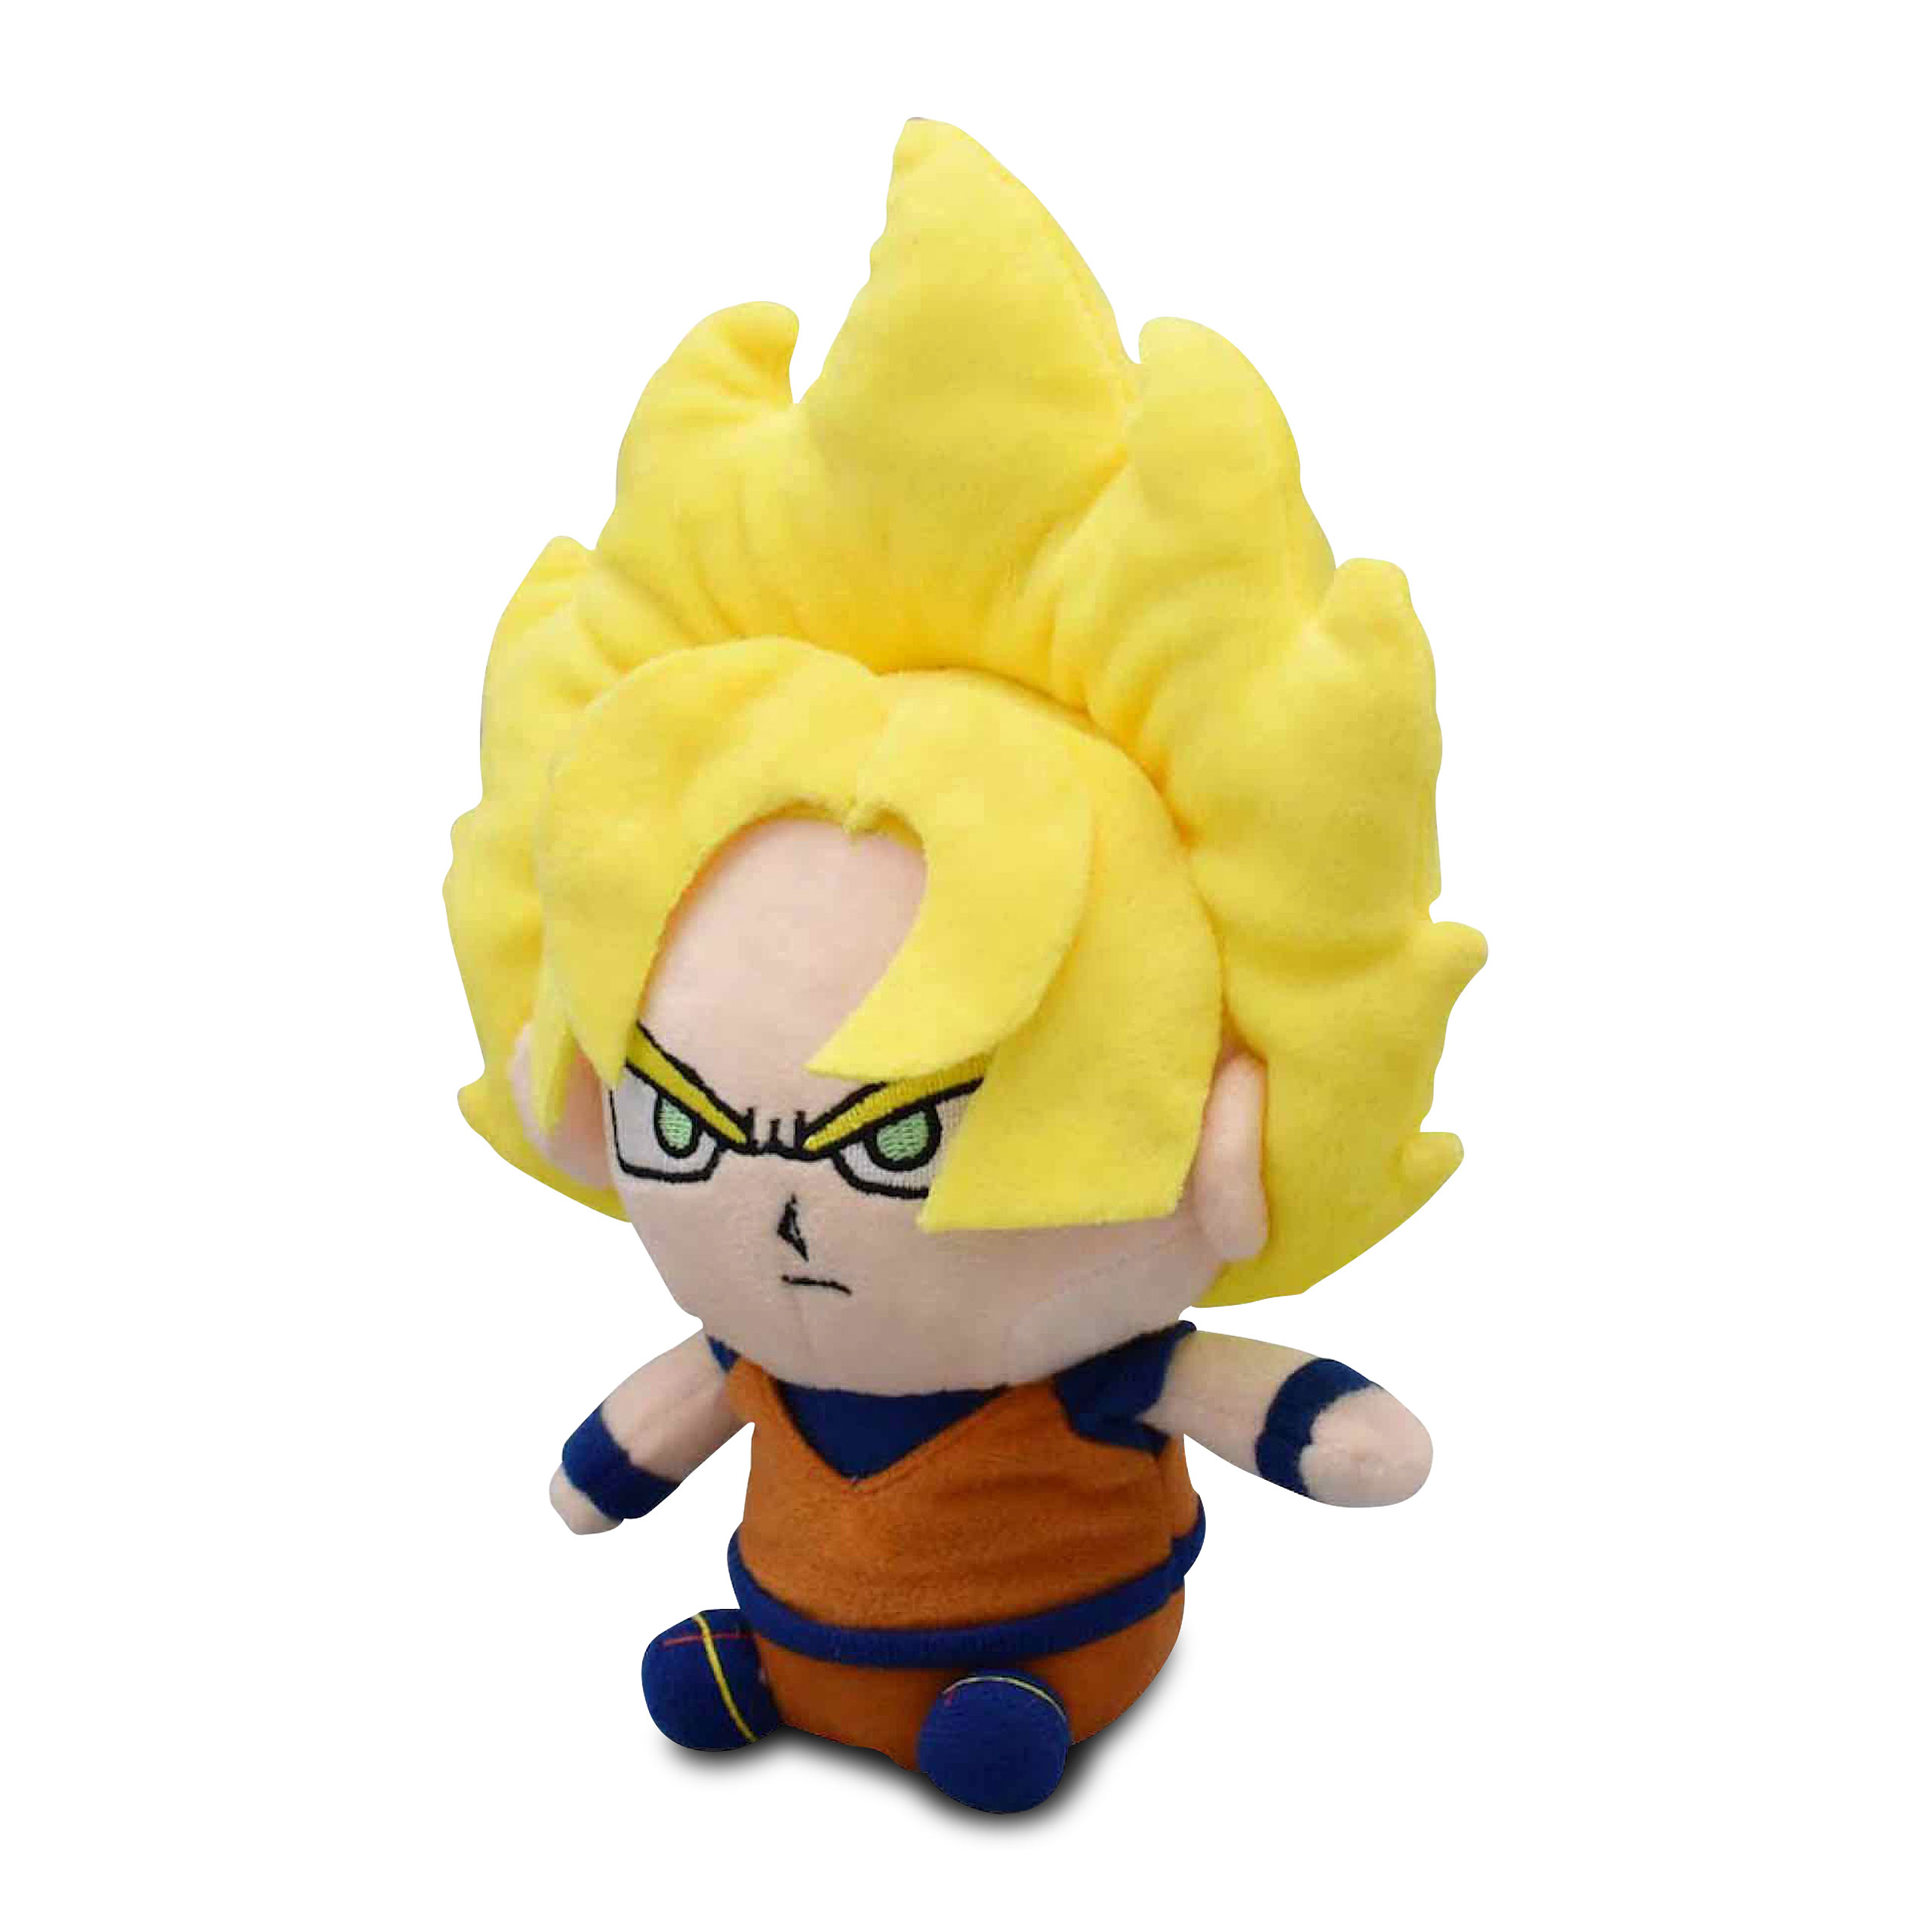 Dragon Ball Z - Super Saiyajin Son Goku Plüsch Figur 21 cm